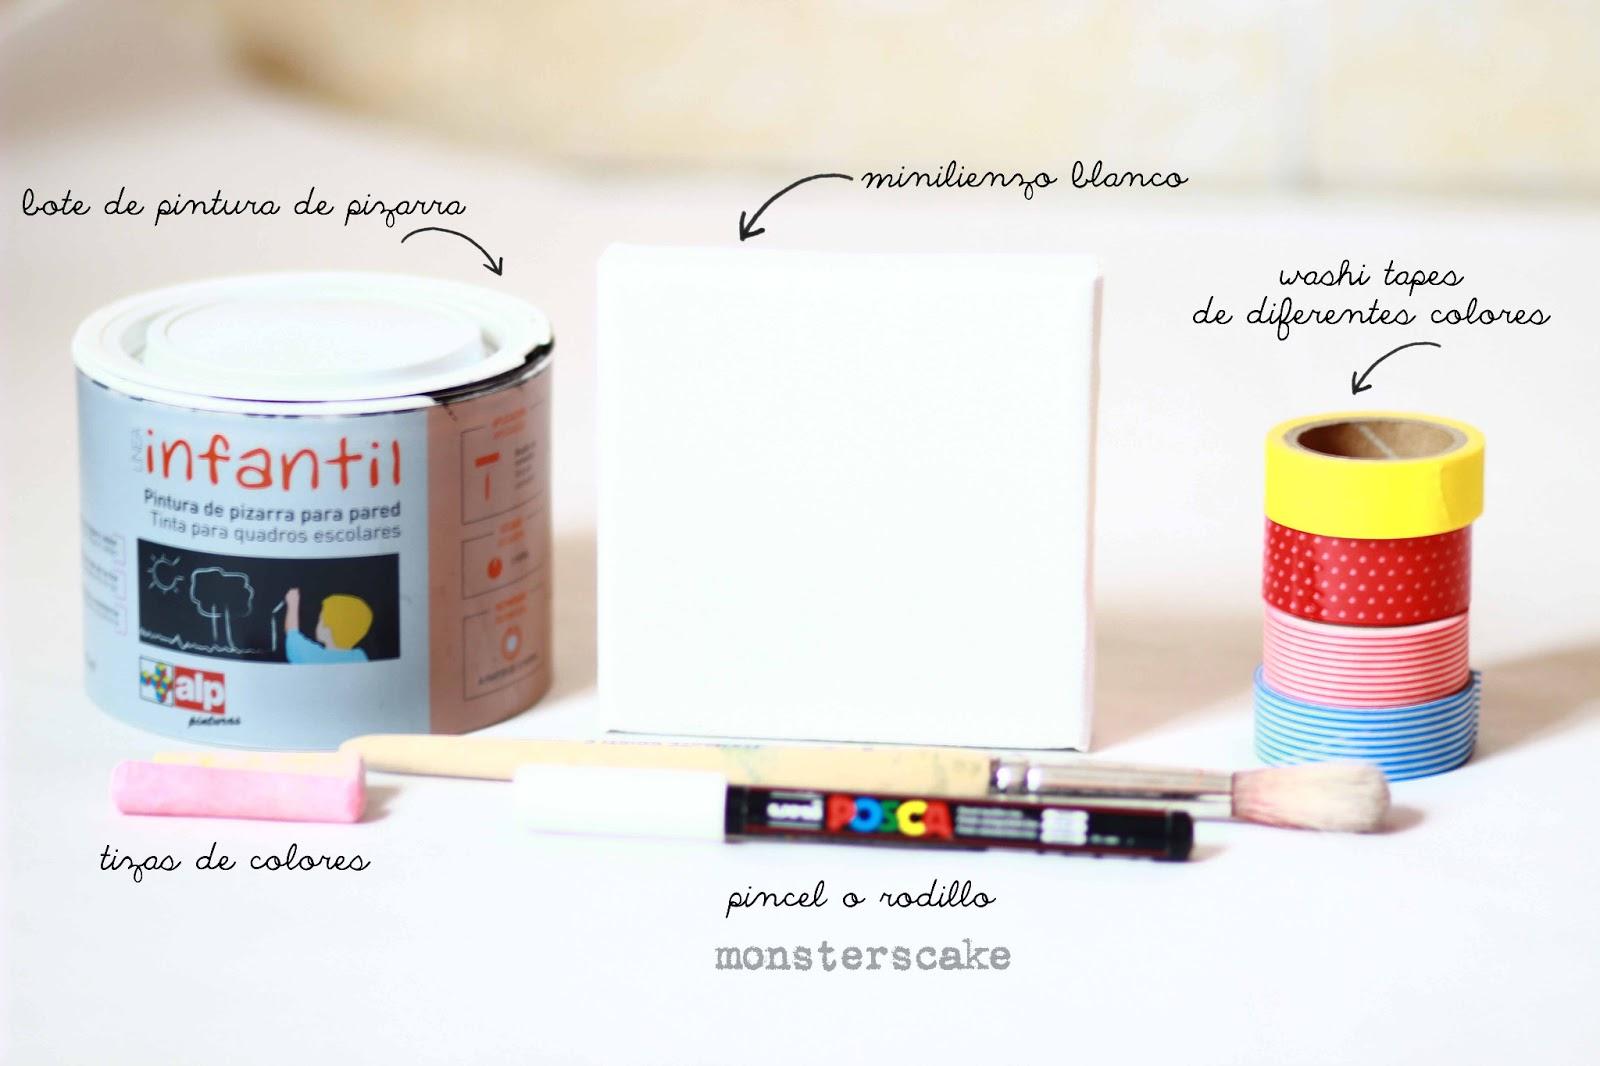 Monsters cake tutorial mini lienzos - Lienzos para decorar ...